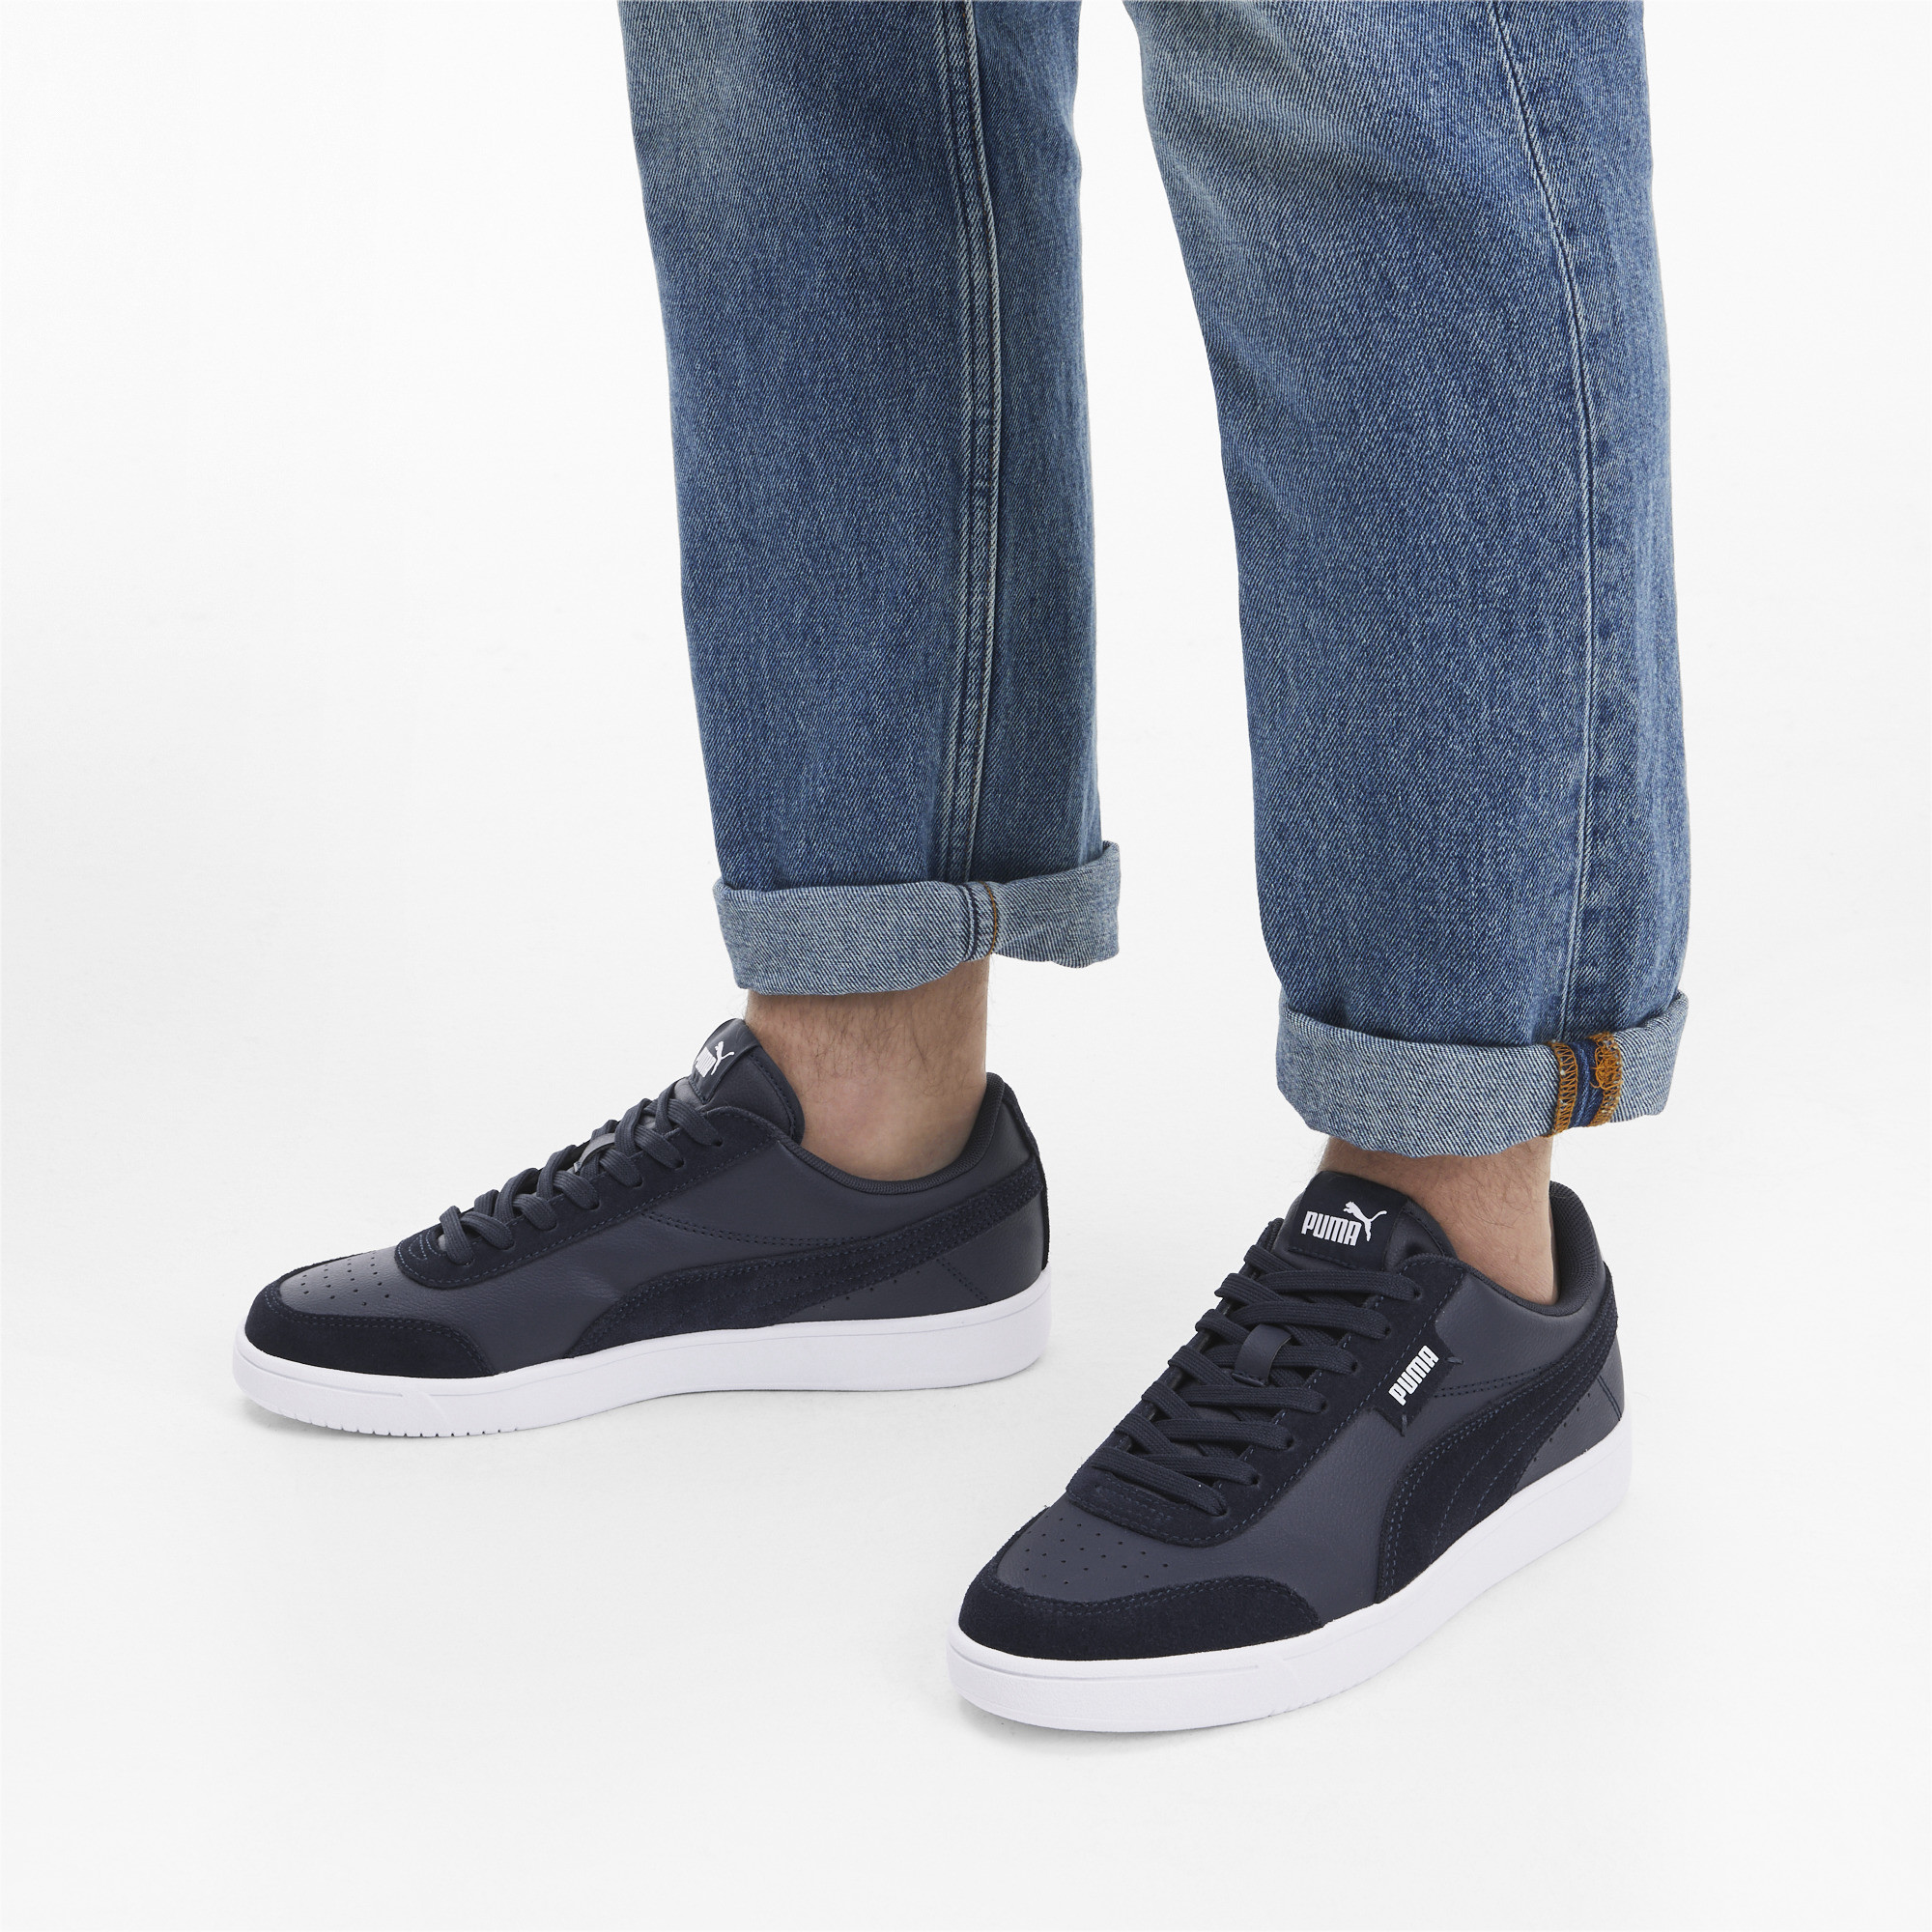 Indexbild 17 - PUMA Court Legend Lo Sneaker Unisex Schuhe Basics Neu